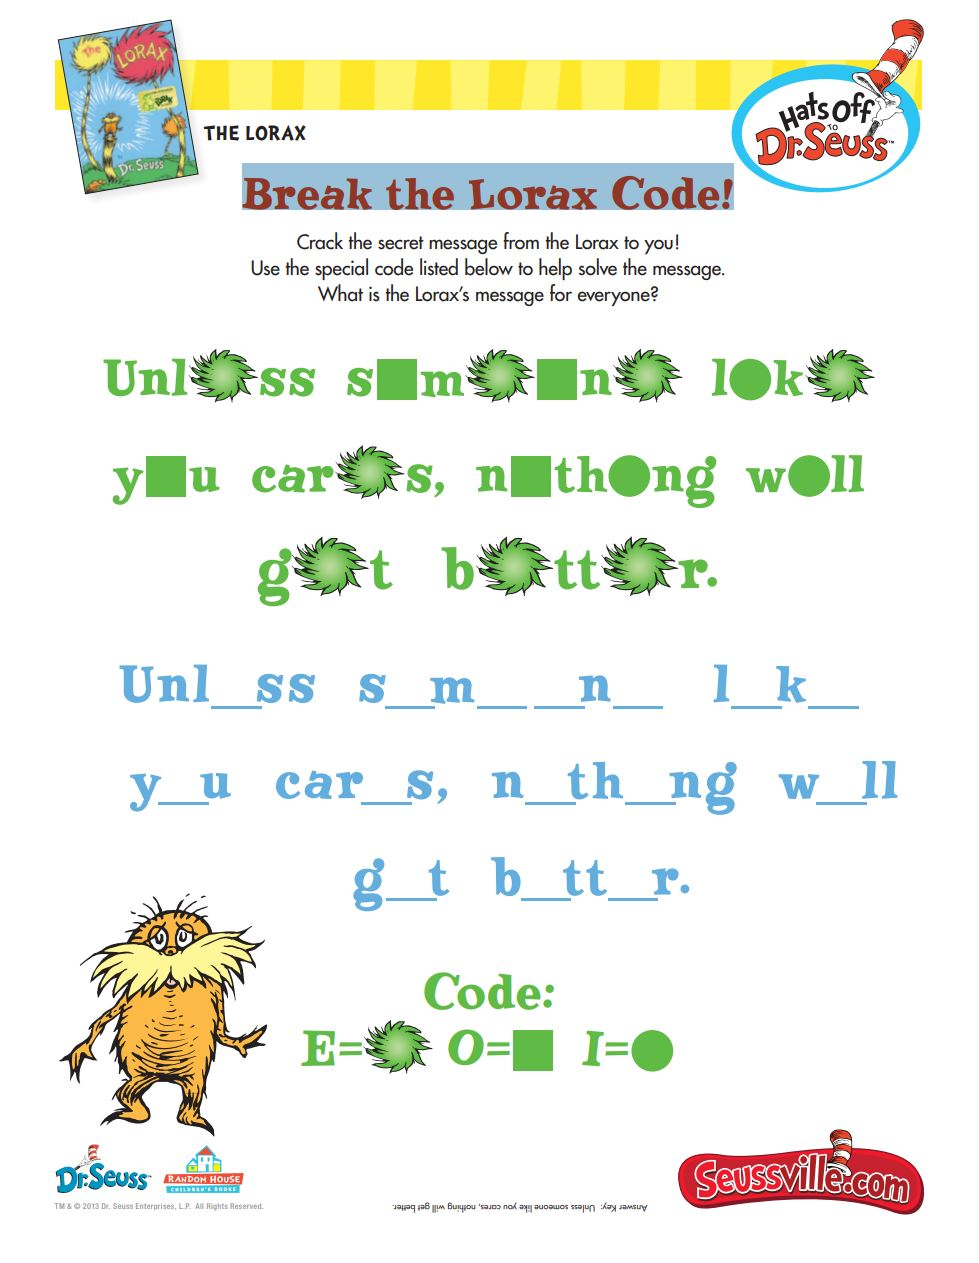 Break the Lorax Code!